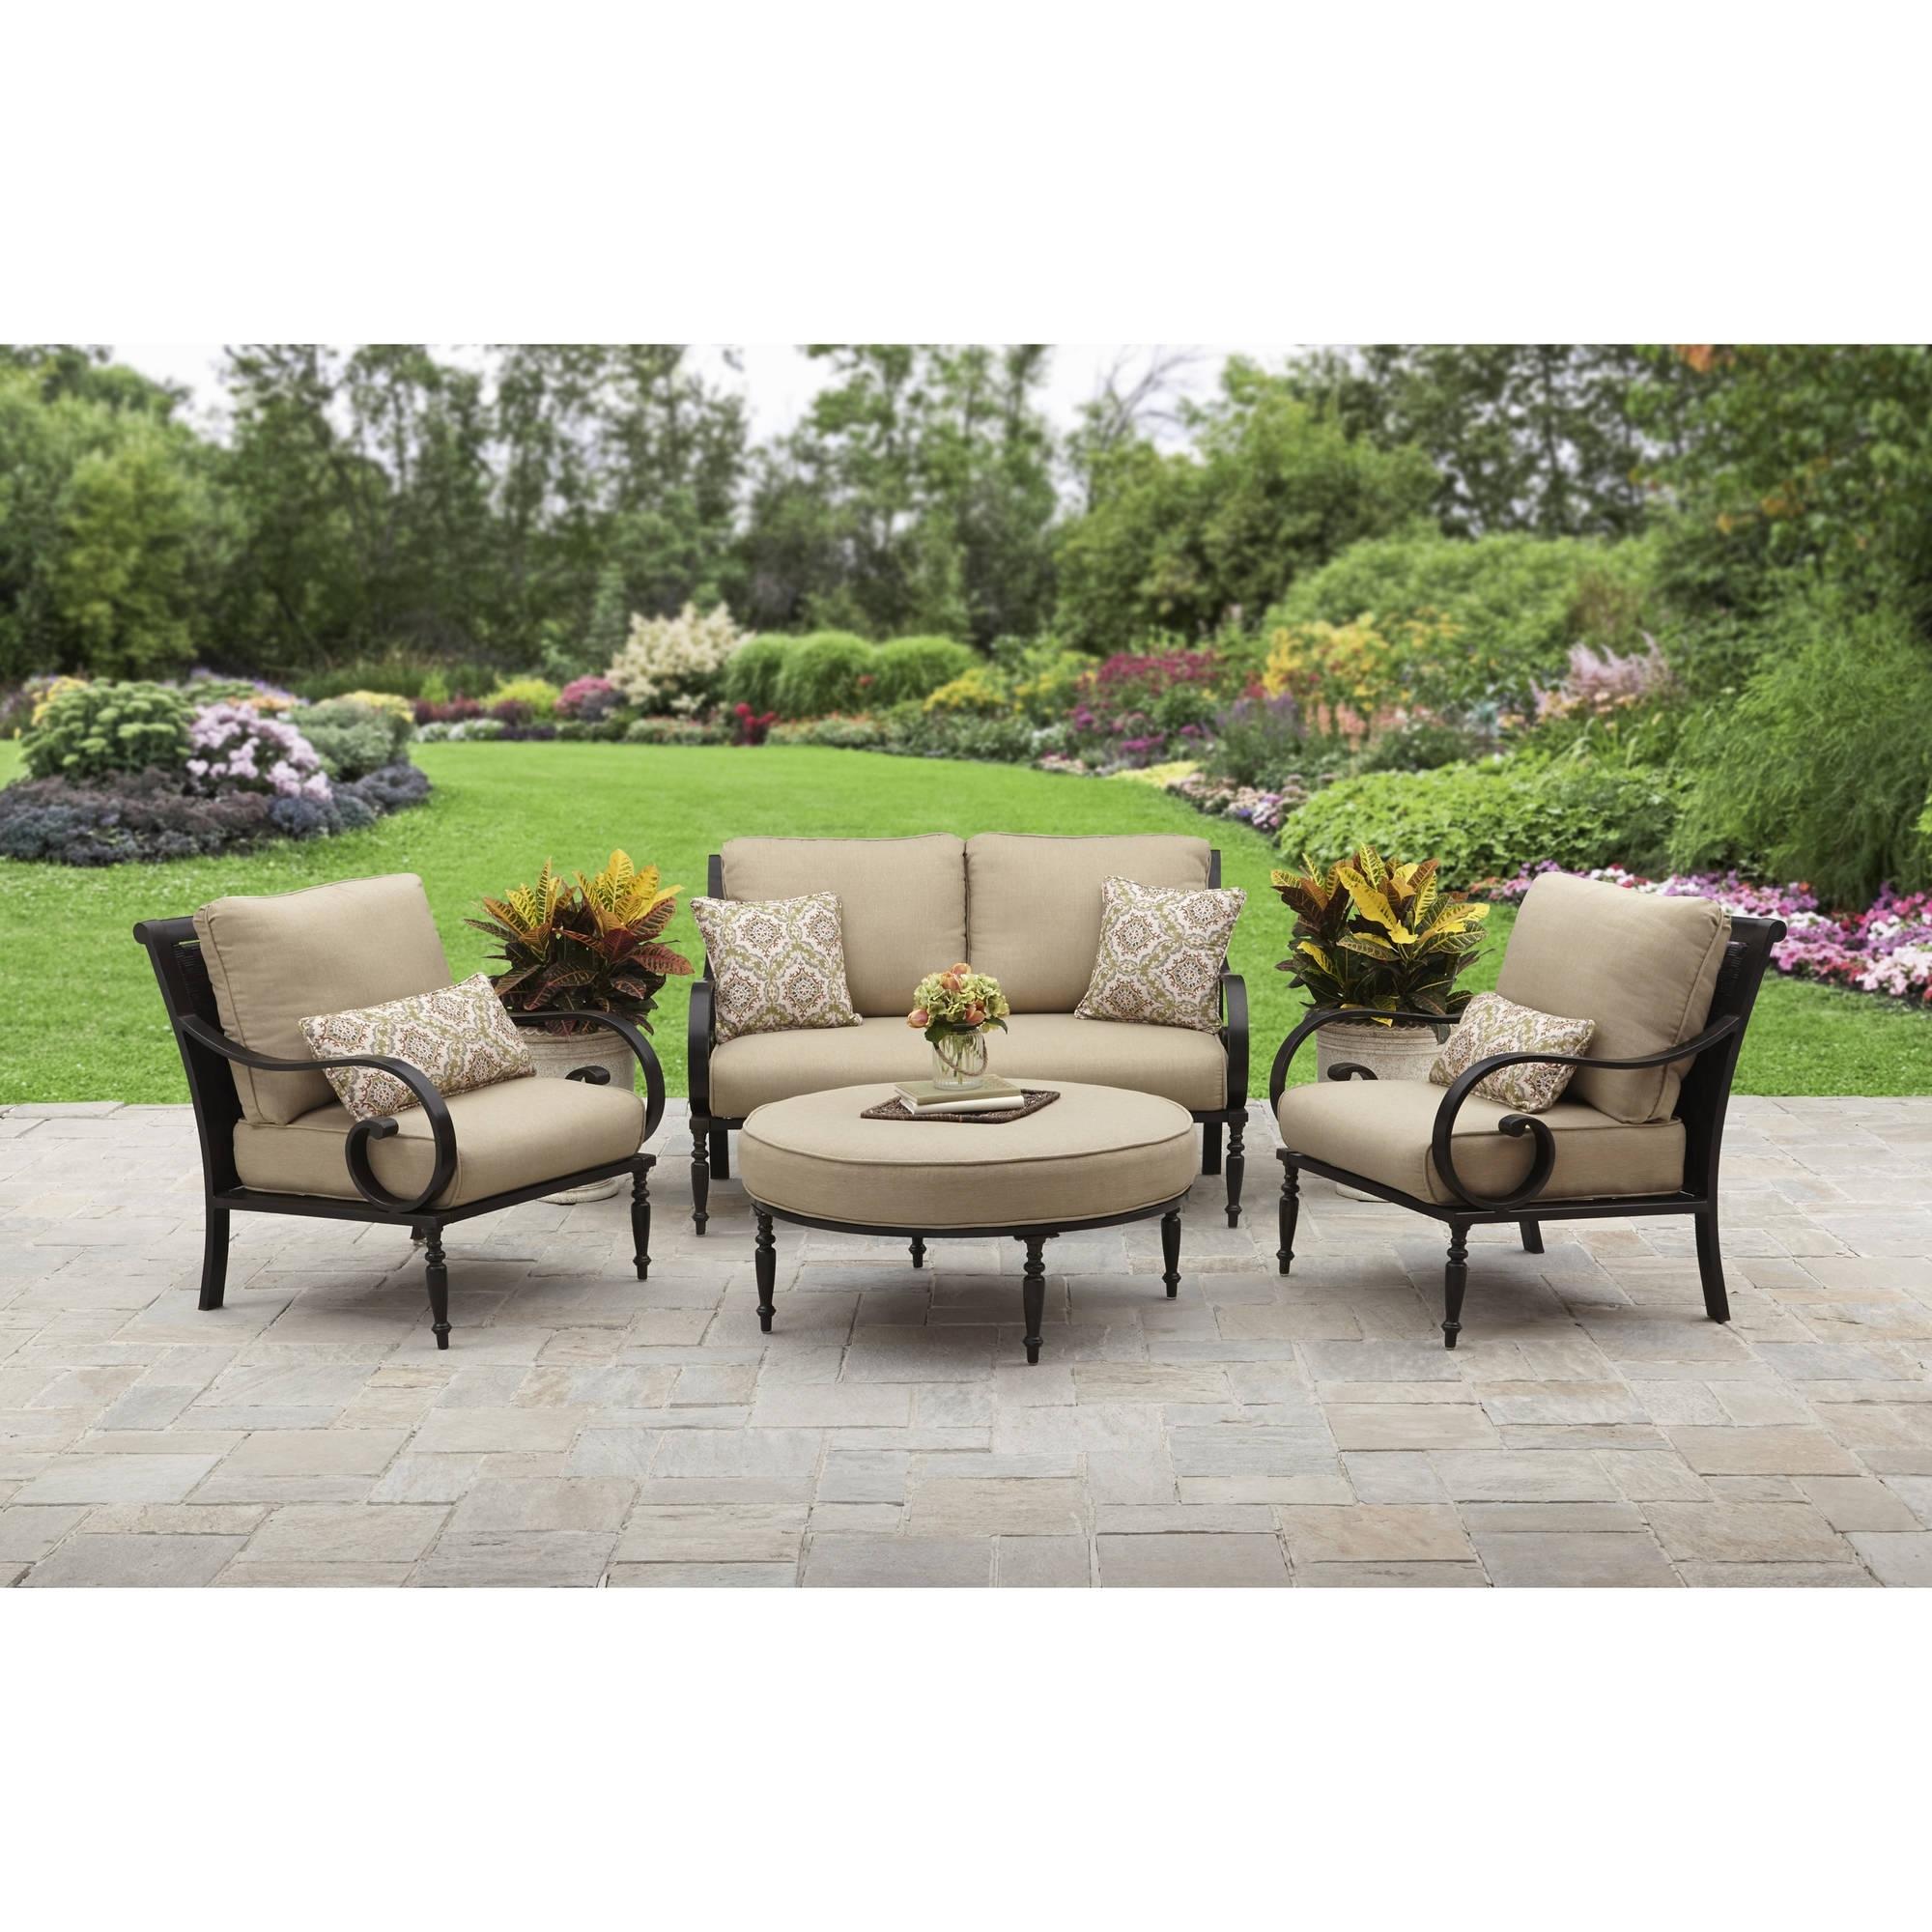 20 inspirations walmart patio furniture